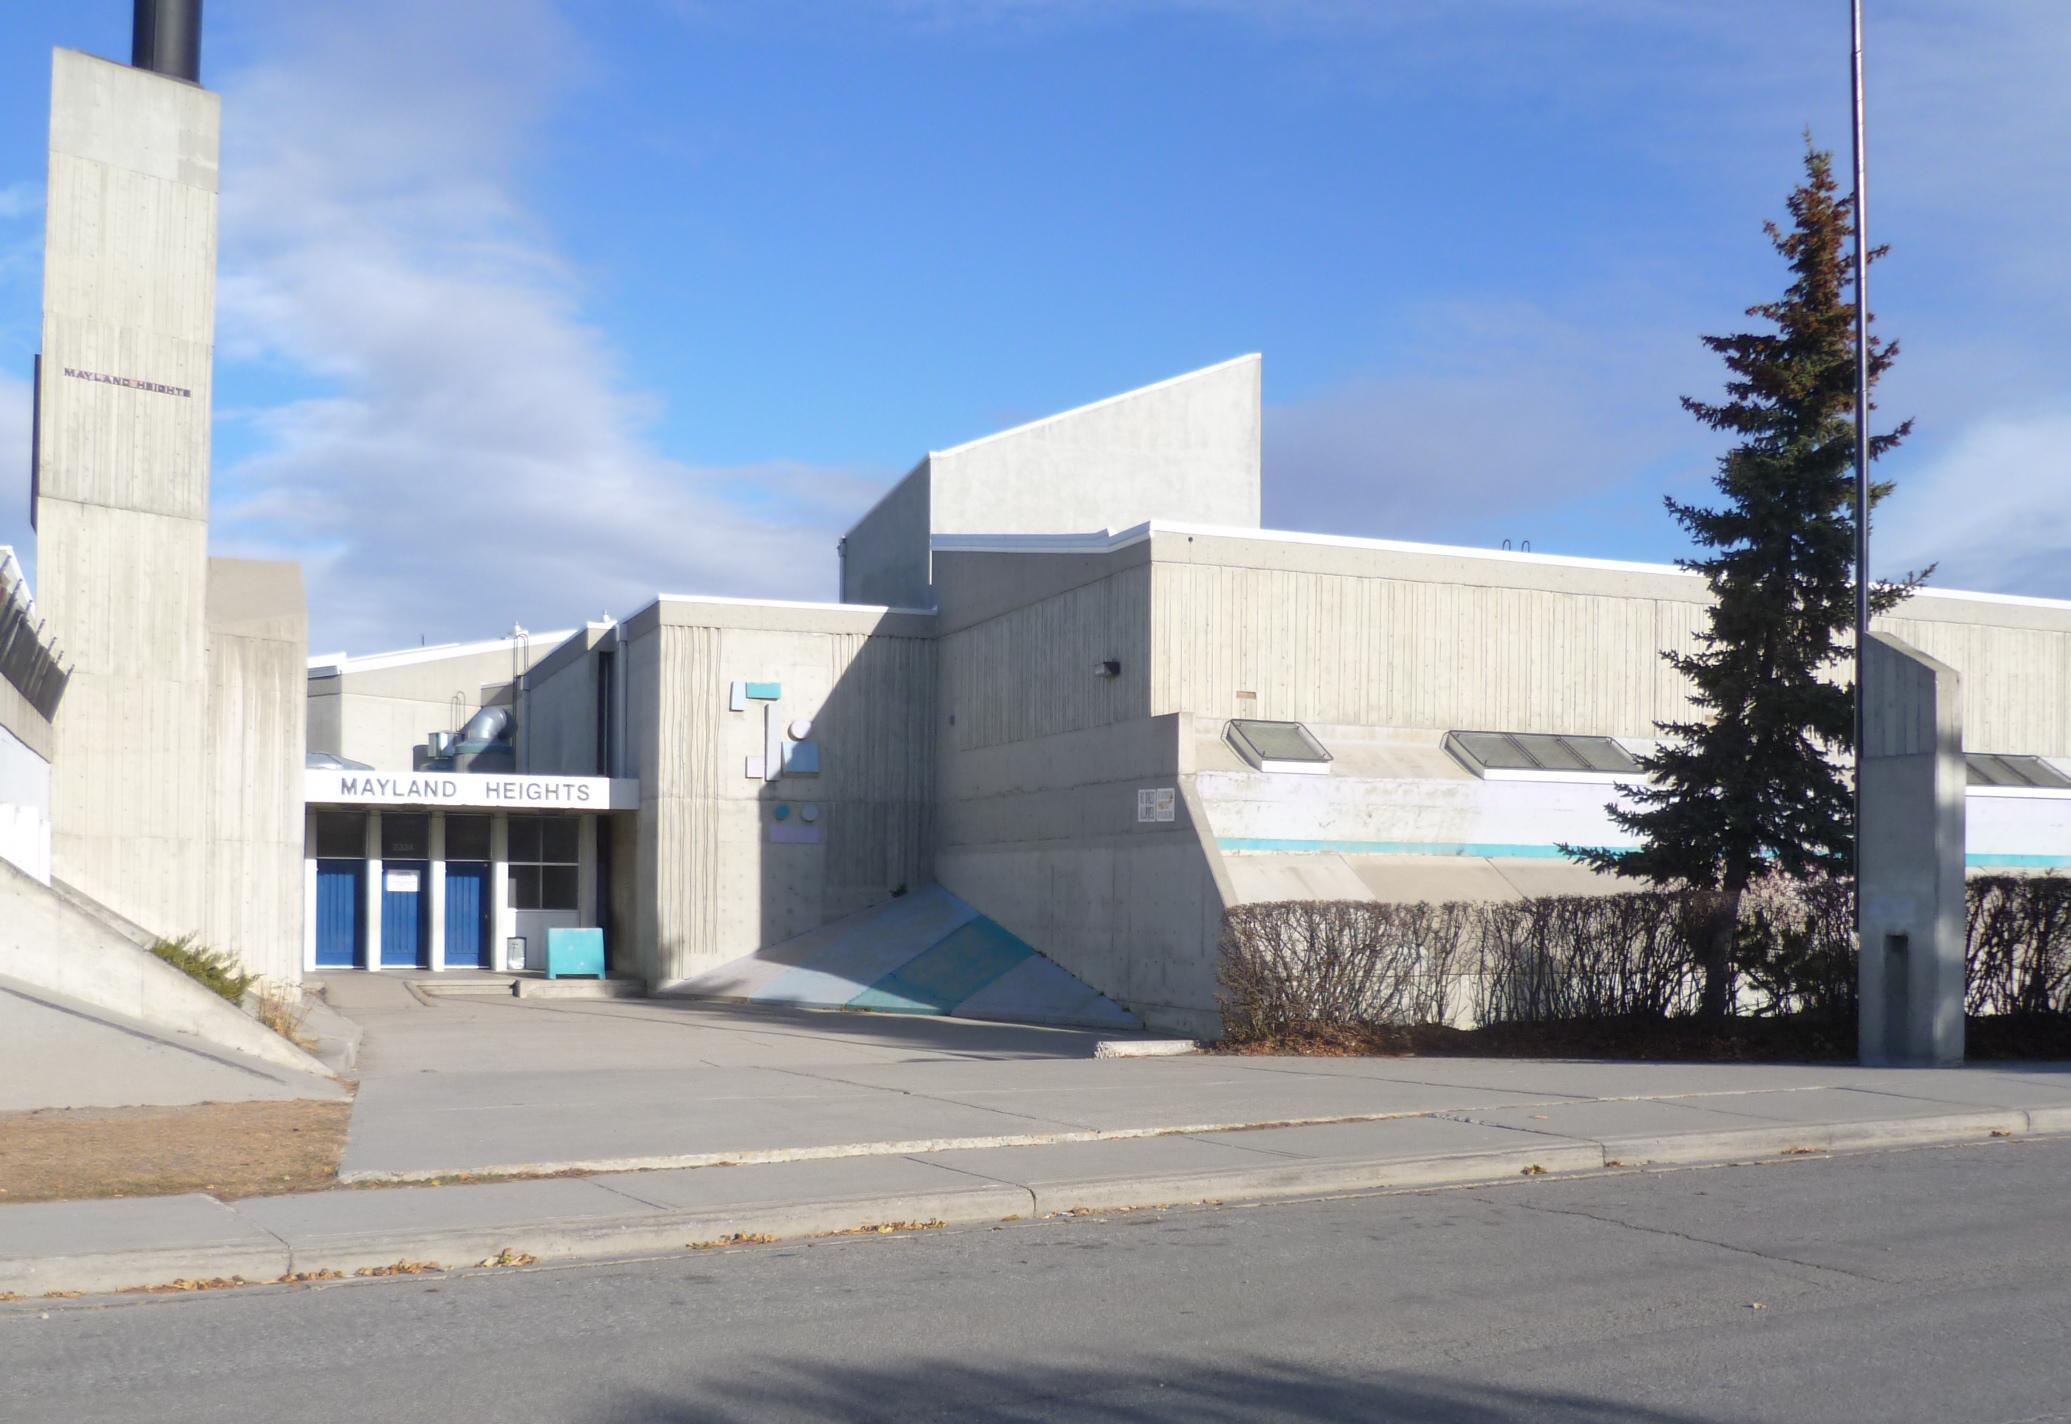 mayland heights elementary school